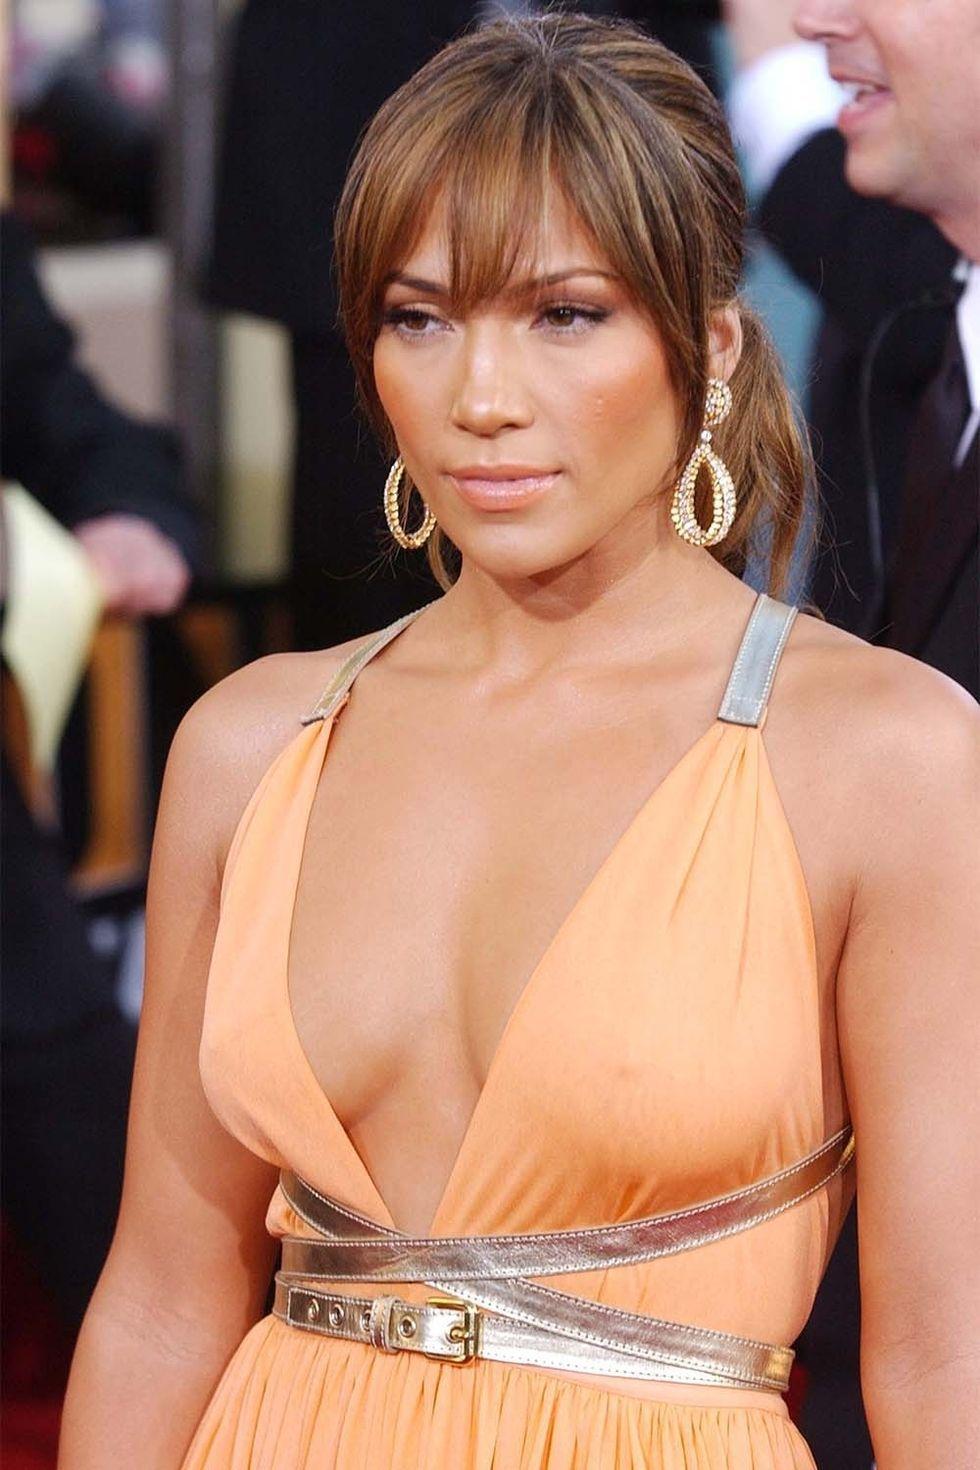 Kourtney Kardashian Braless. 2018-2019 celebrityes photos leaks! nude (44 photos), Pussy Celebrity pic